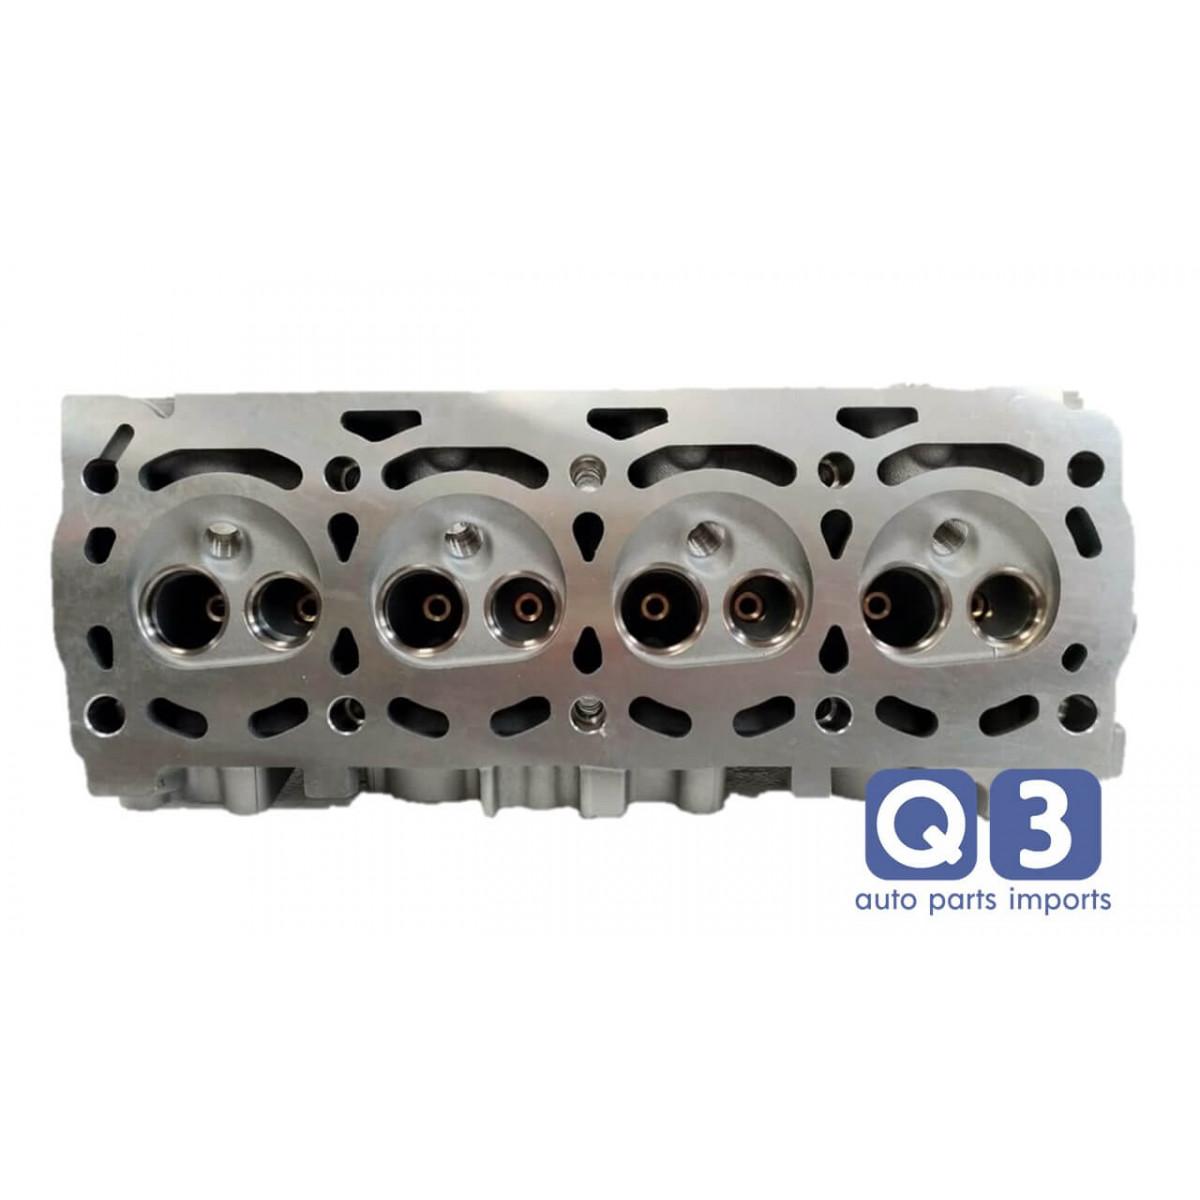 Cabeçote Volkswagen Fox 1.0 8V Motor Power Novo